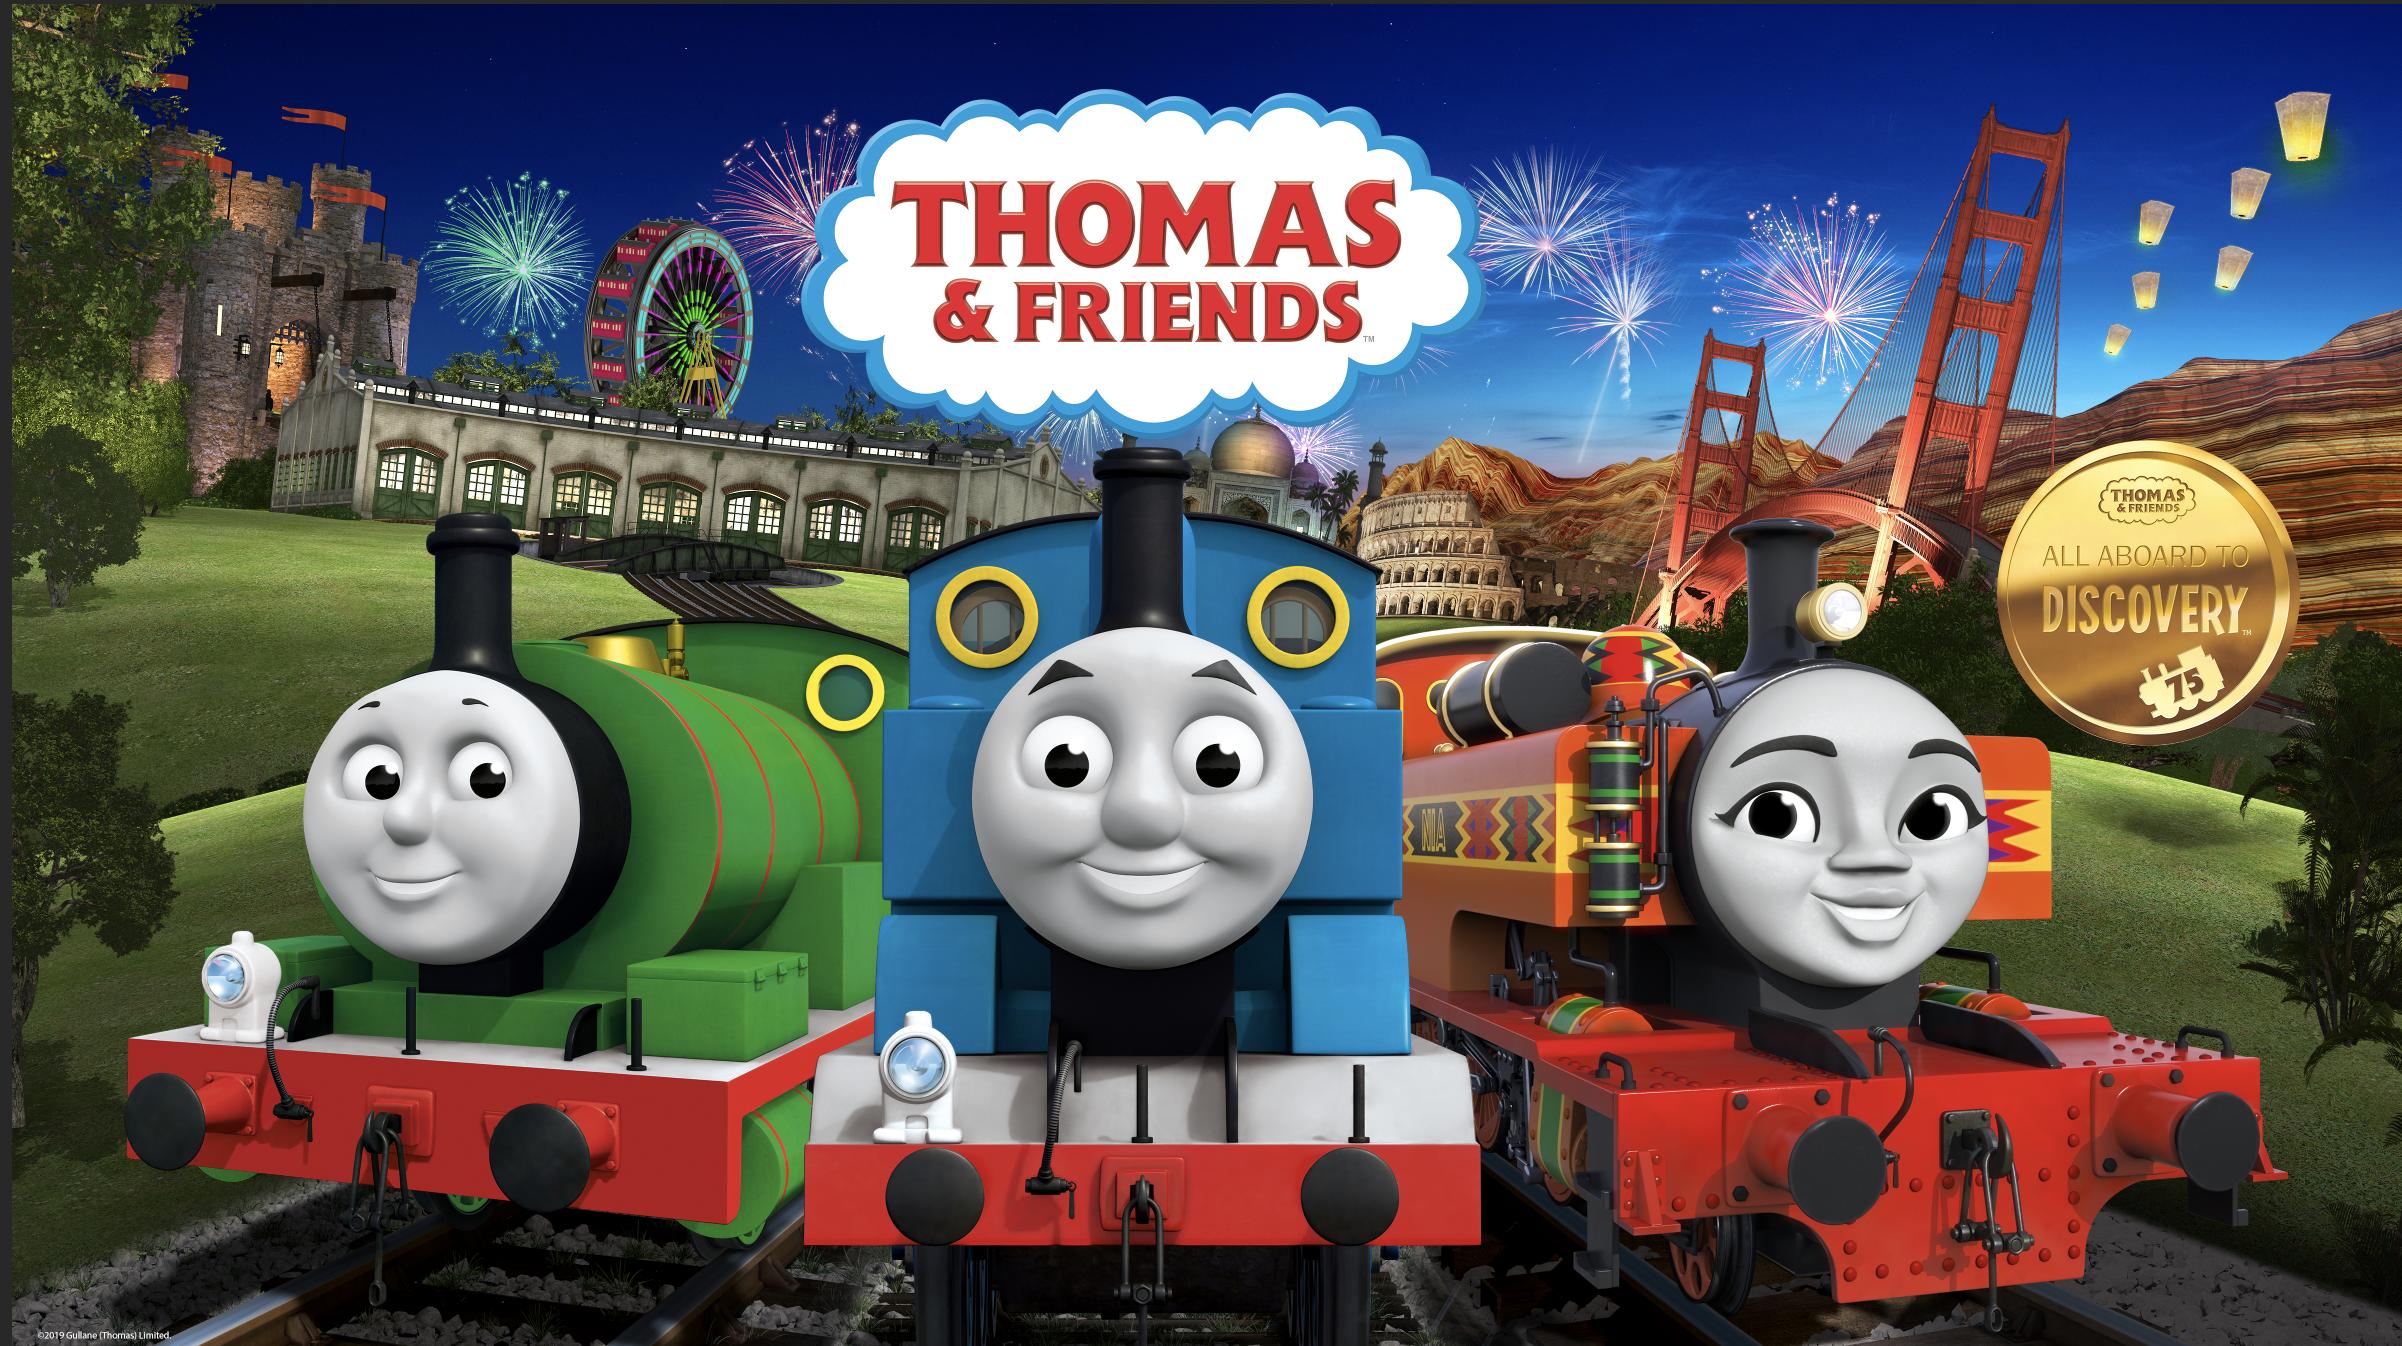 Trenino Thomas sigla: ecco il testo completo